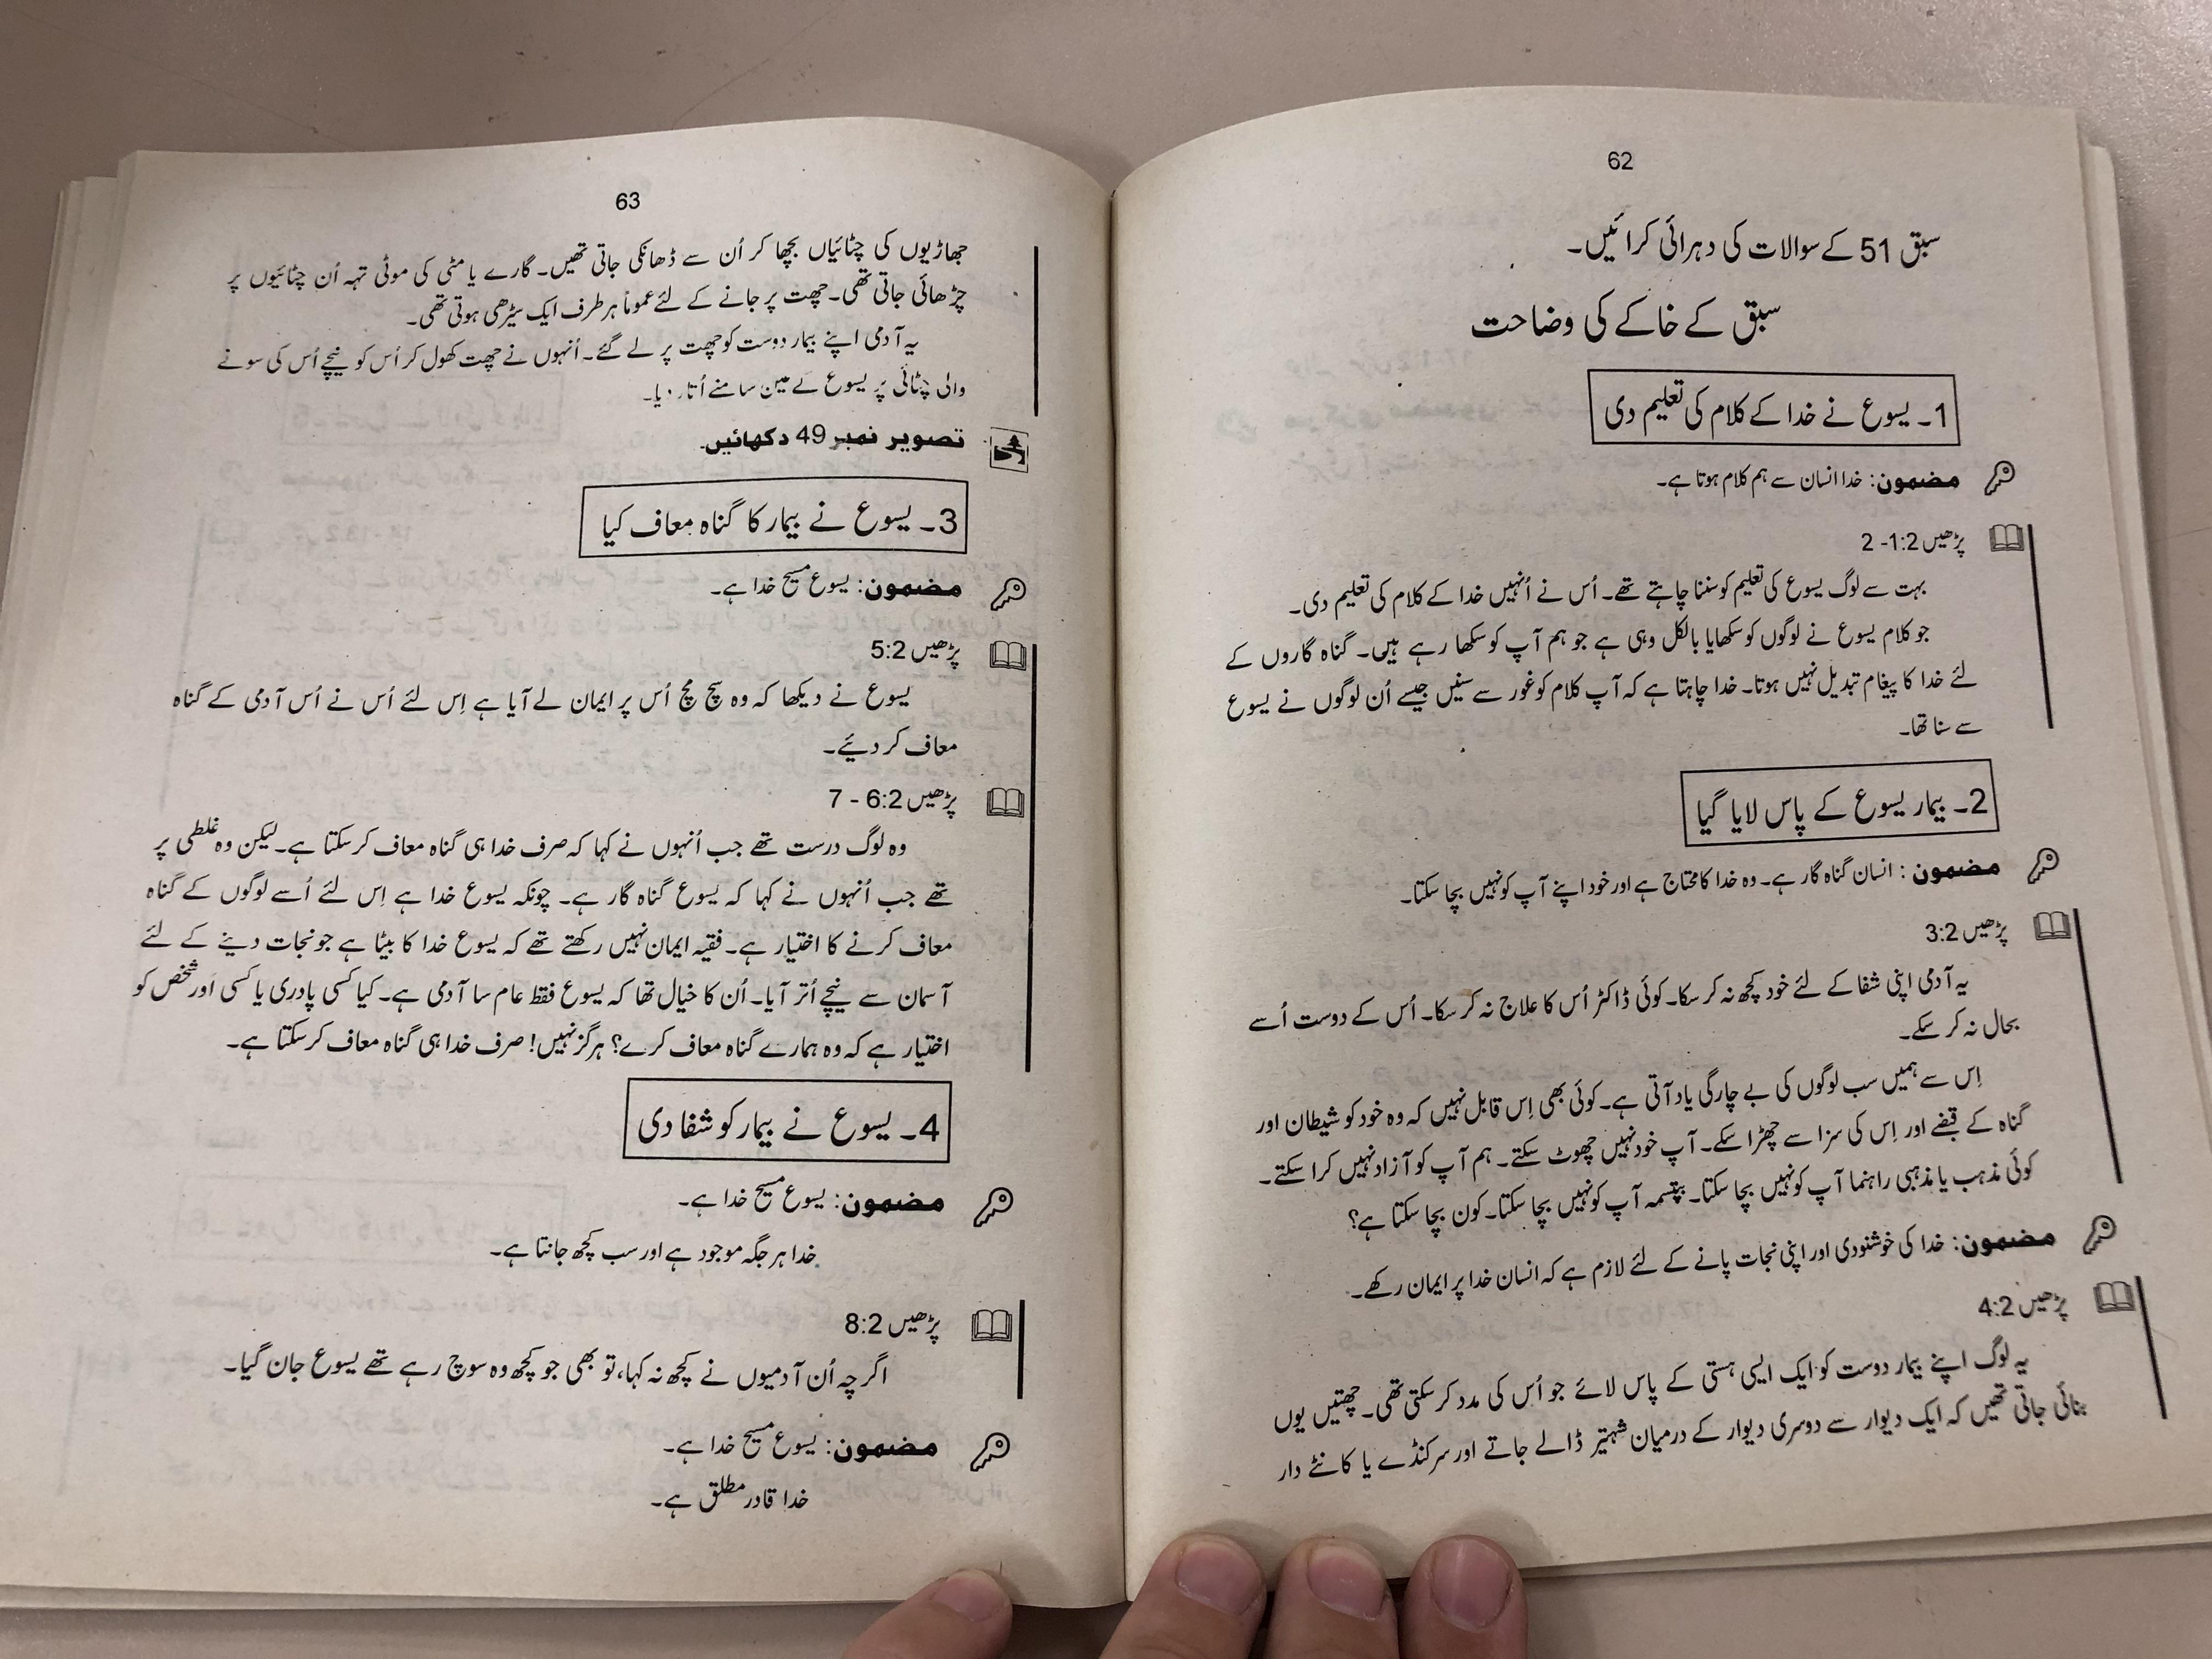 building-on-firm-foundations-vol.2-by-trevor-mcilwain-urdu-edition-evangelism-the-old-testament-pakistan-2007-8-.jpg